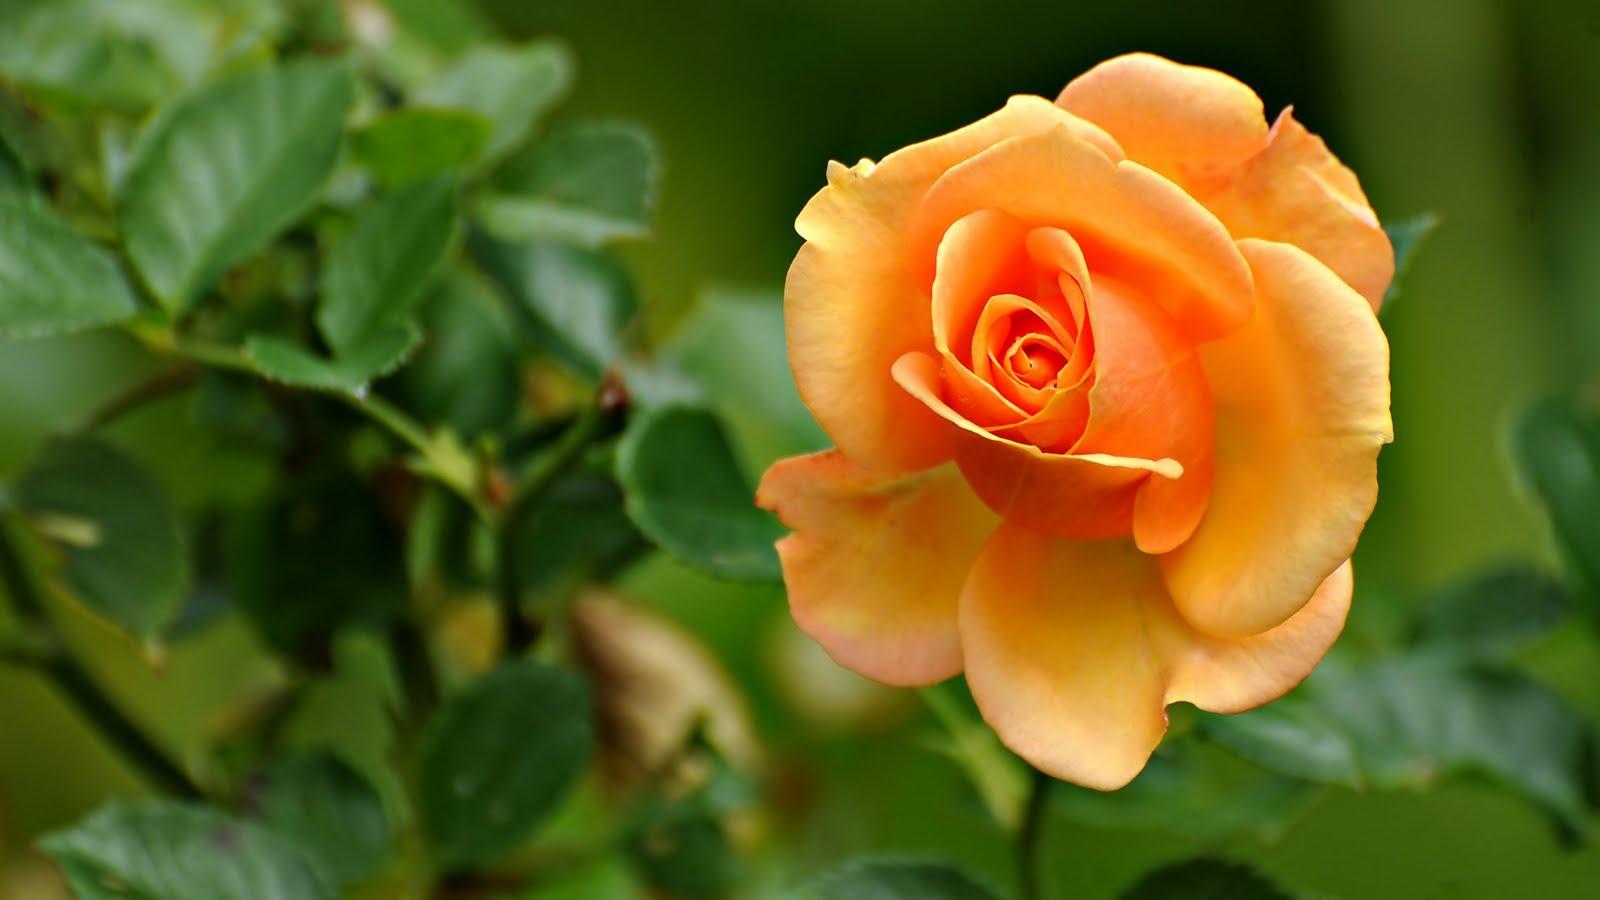 Beautiful yellow orange flower rose hd wallpaper the - Hd flower wallpaper rose ...